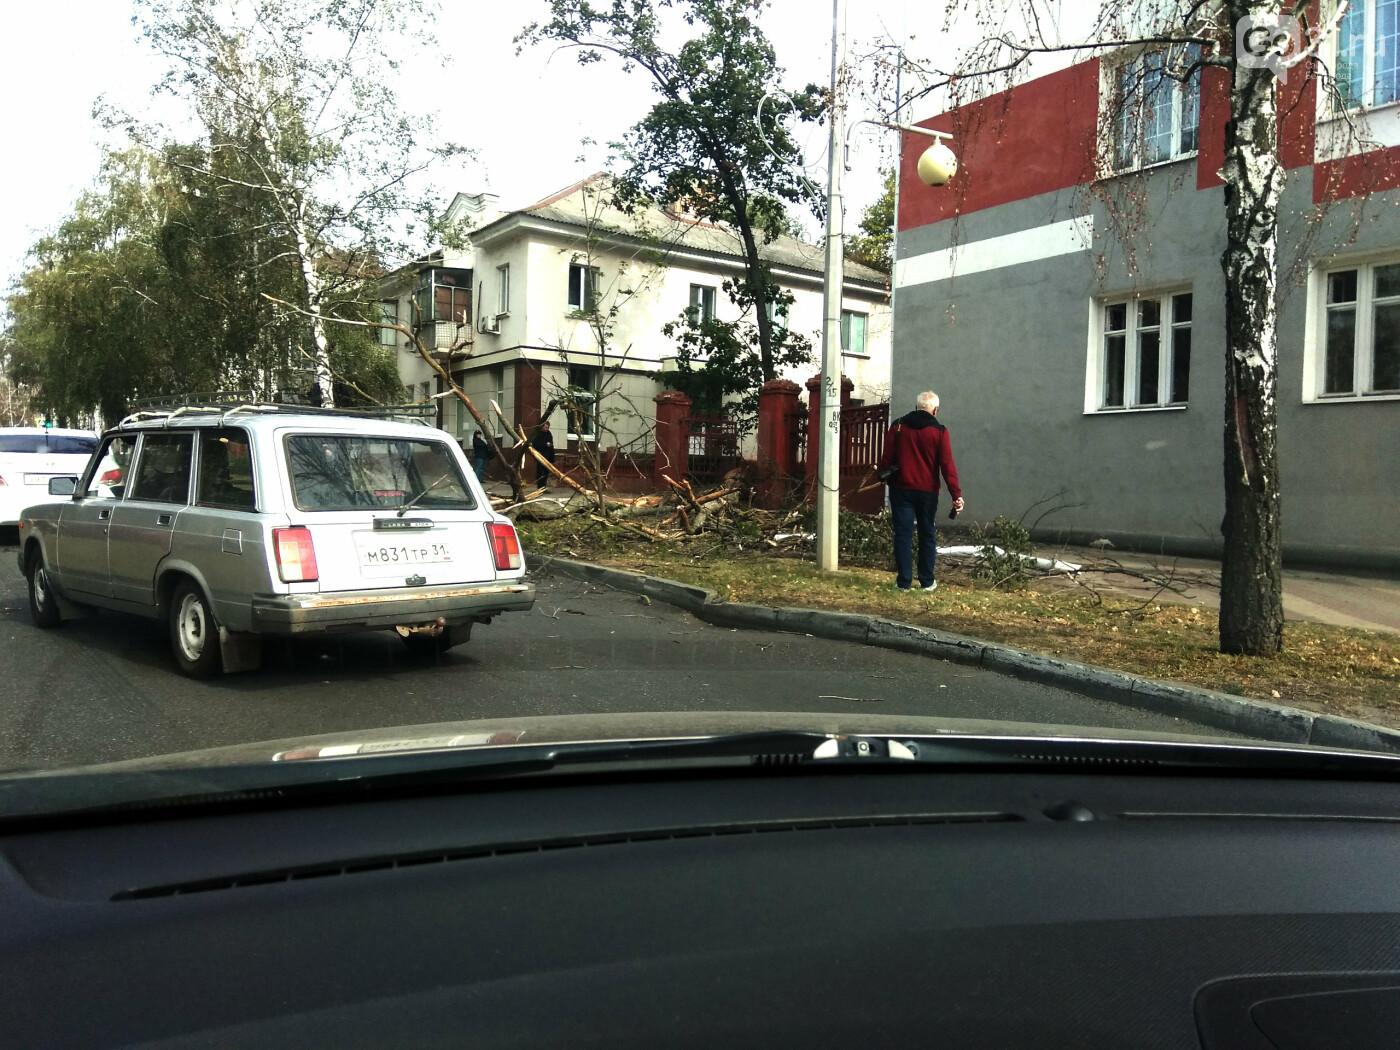 В центре Белгорода упавшее дерево едва не зацепило машины, фото-4, Фото: Оксана Булгакова